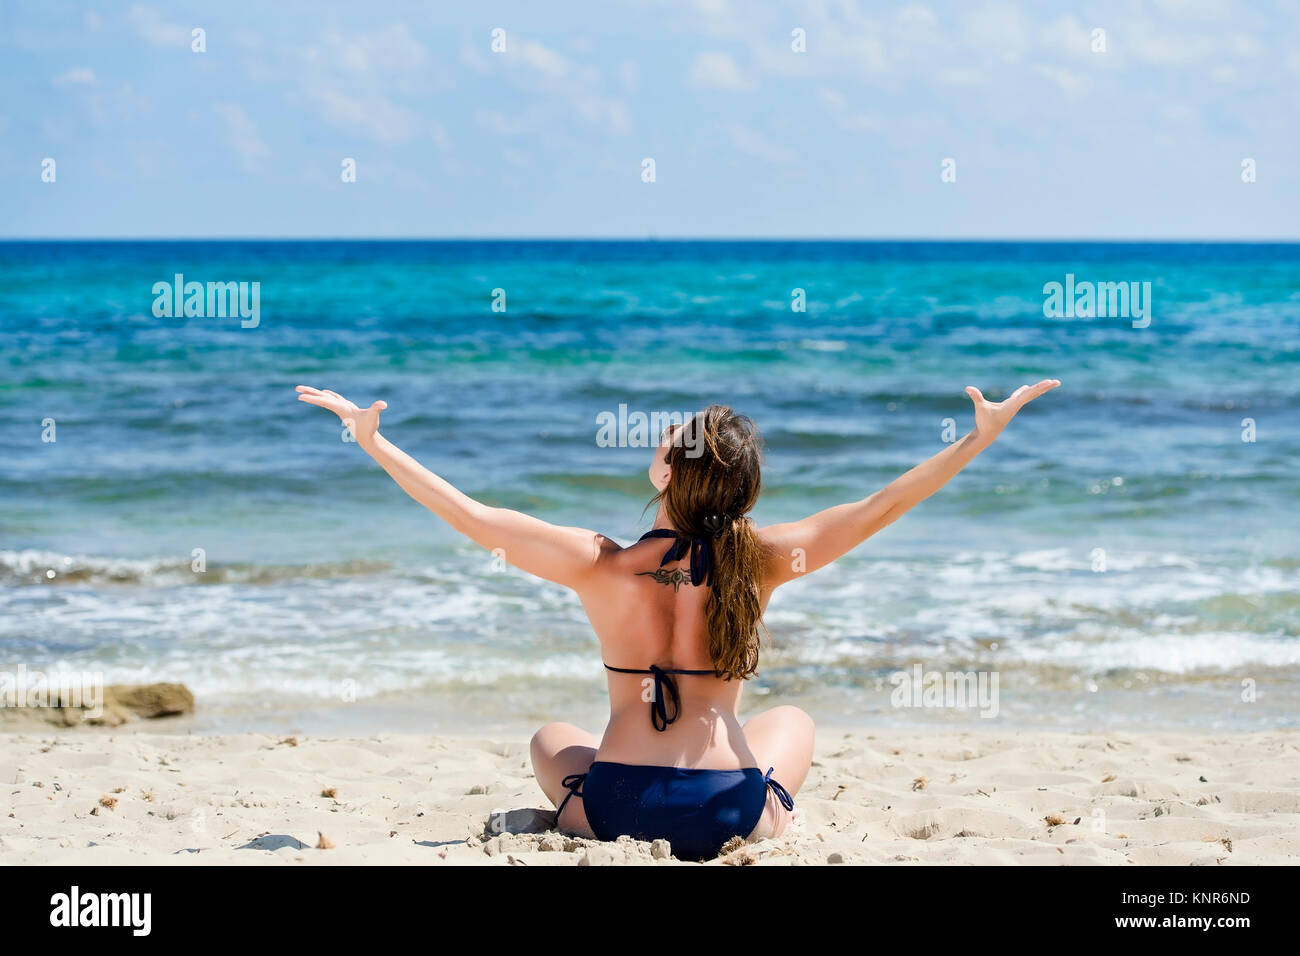 Frau im Bikini geniesst den Urlaub am Strand, Ibiza, Spanien - woman makes holiday at the beach, Ibiza, Spain - Stock Image